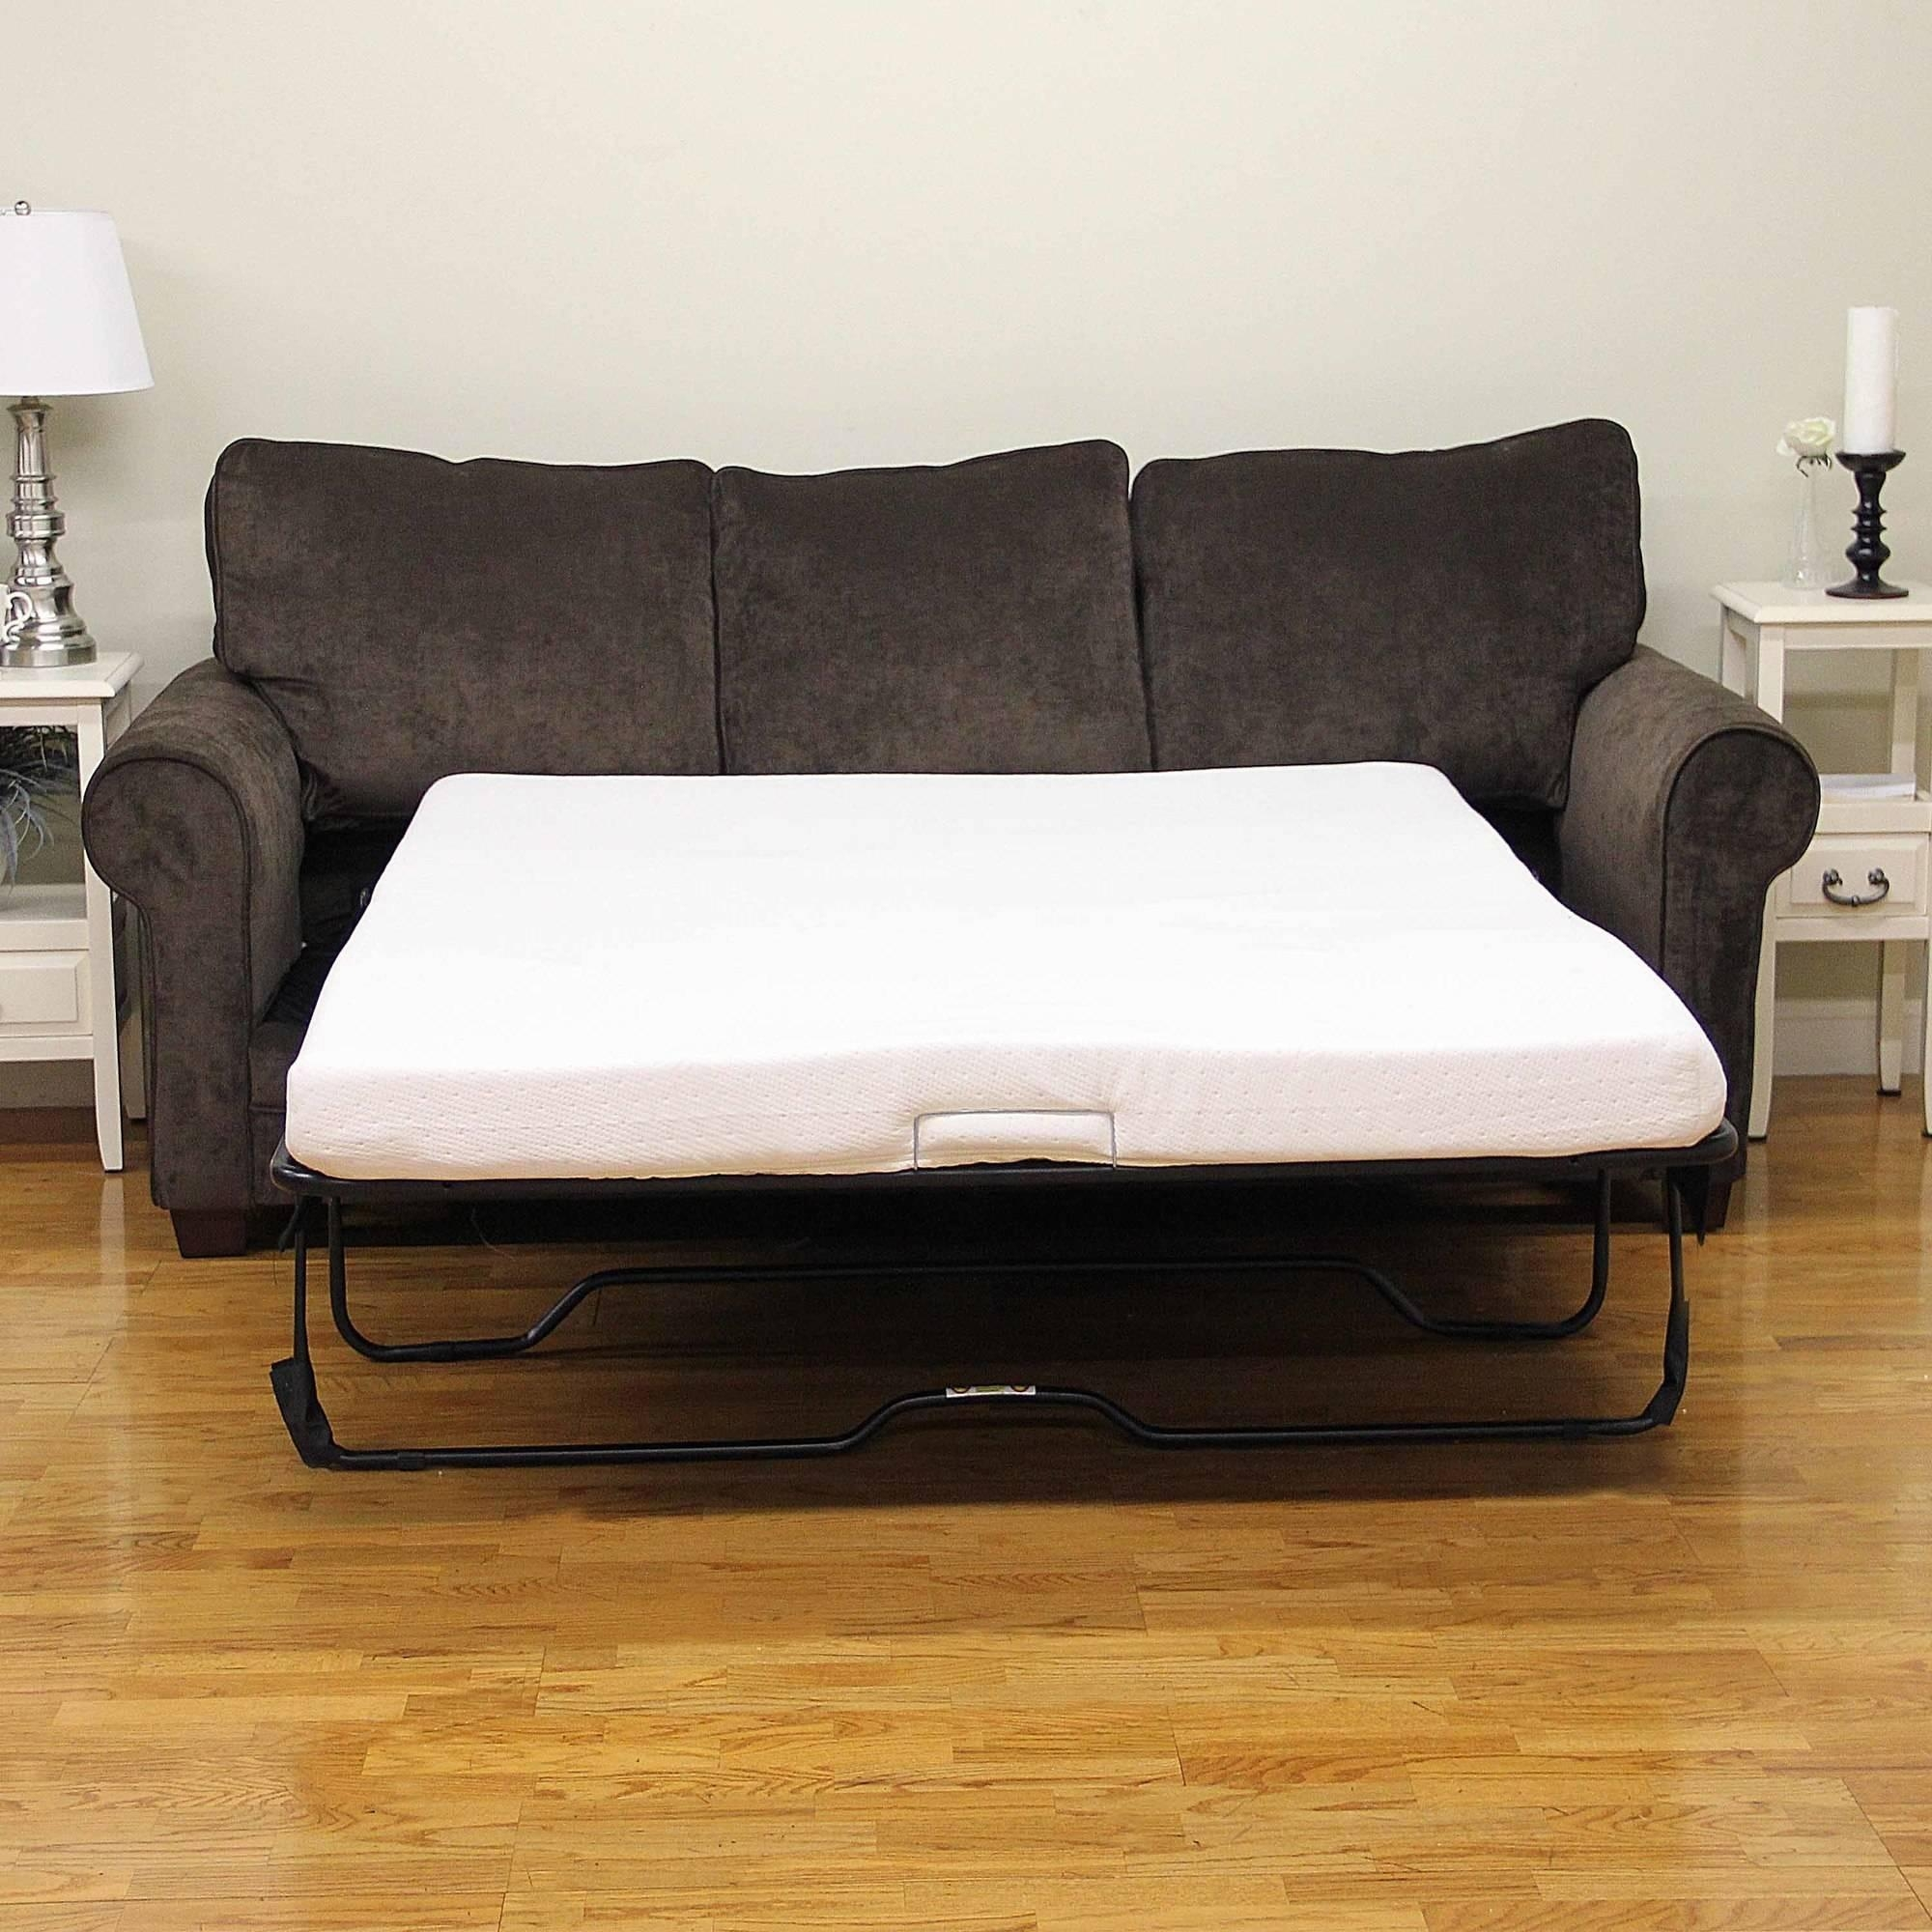 Modern Sleep Memory Foam (View 16 of 20)